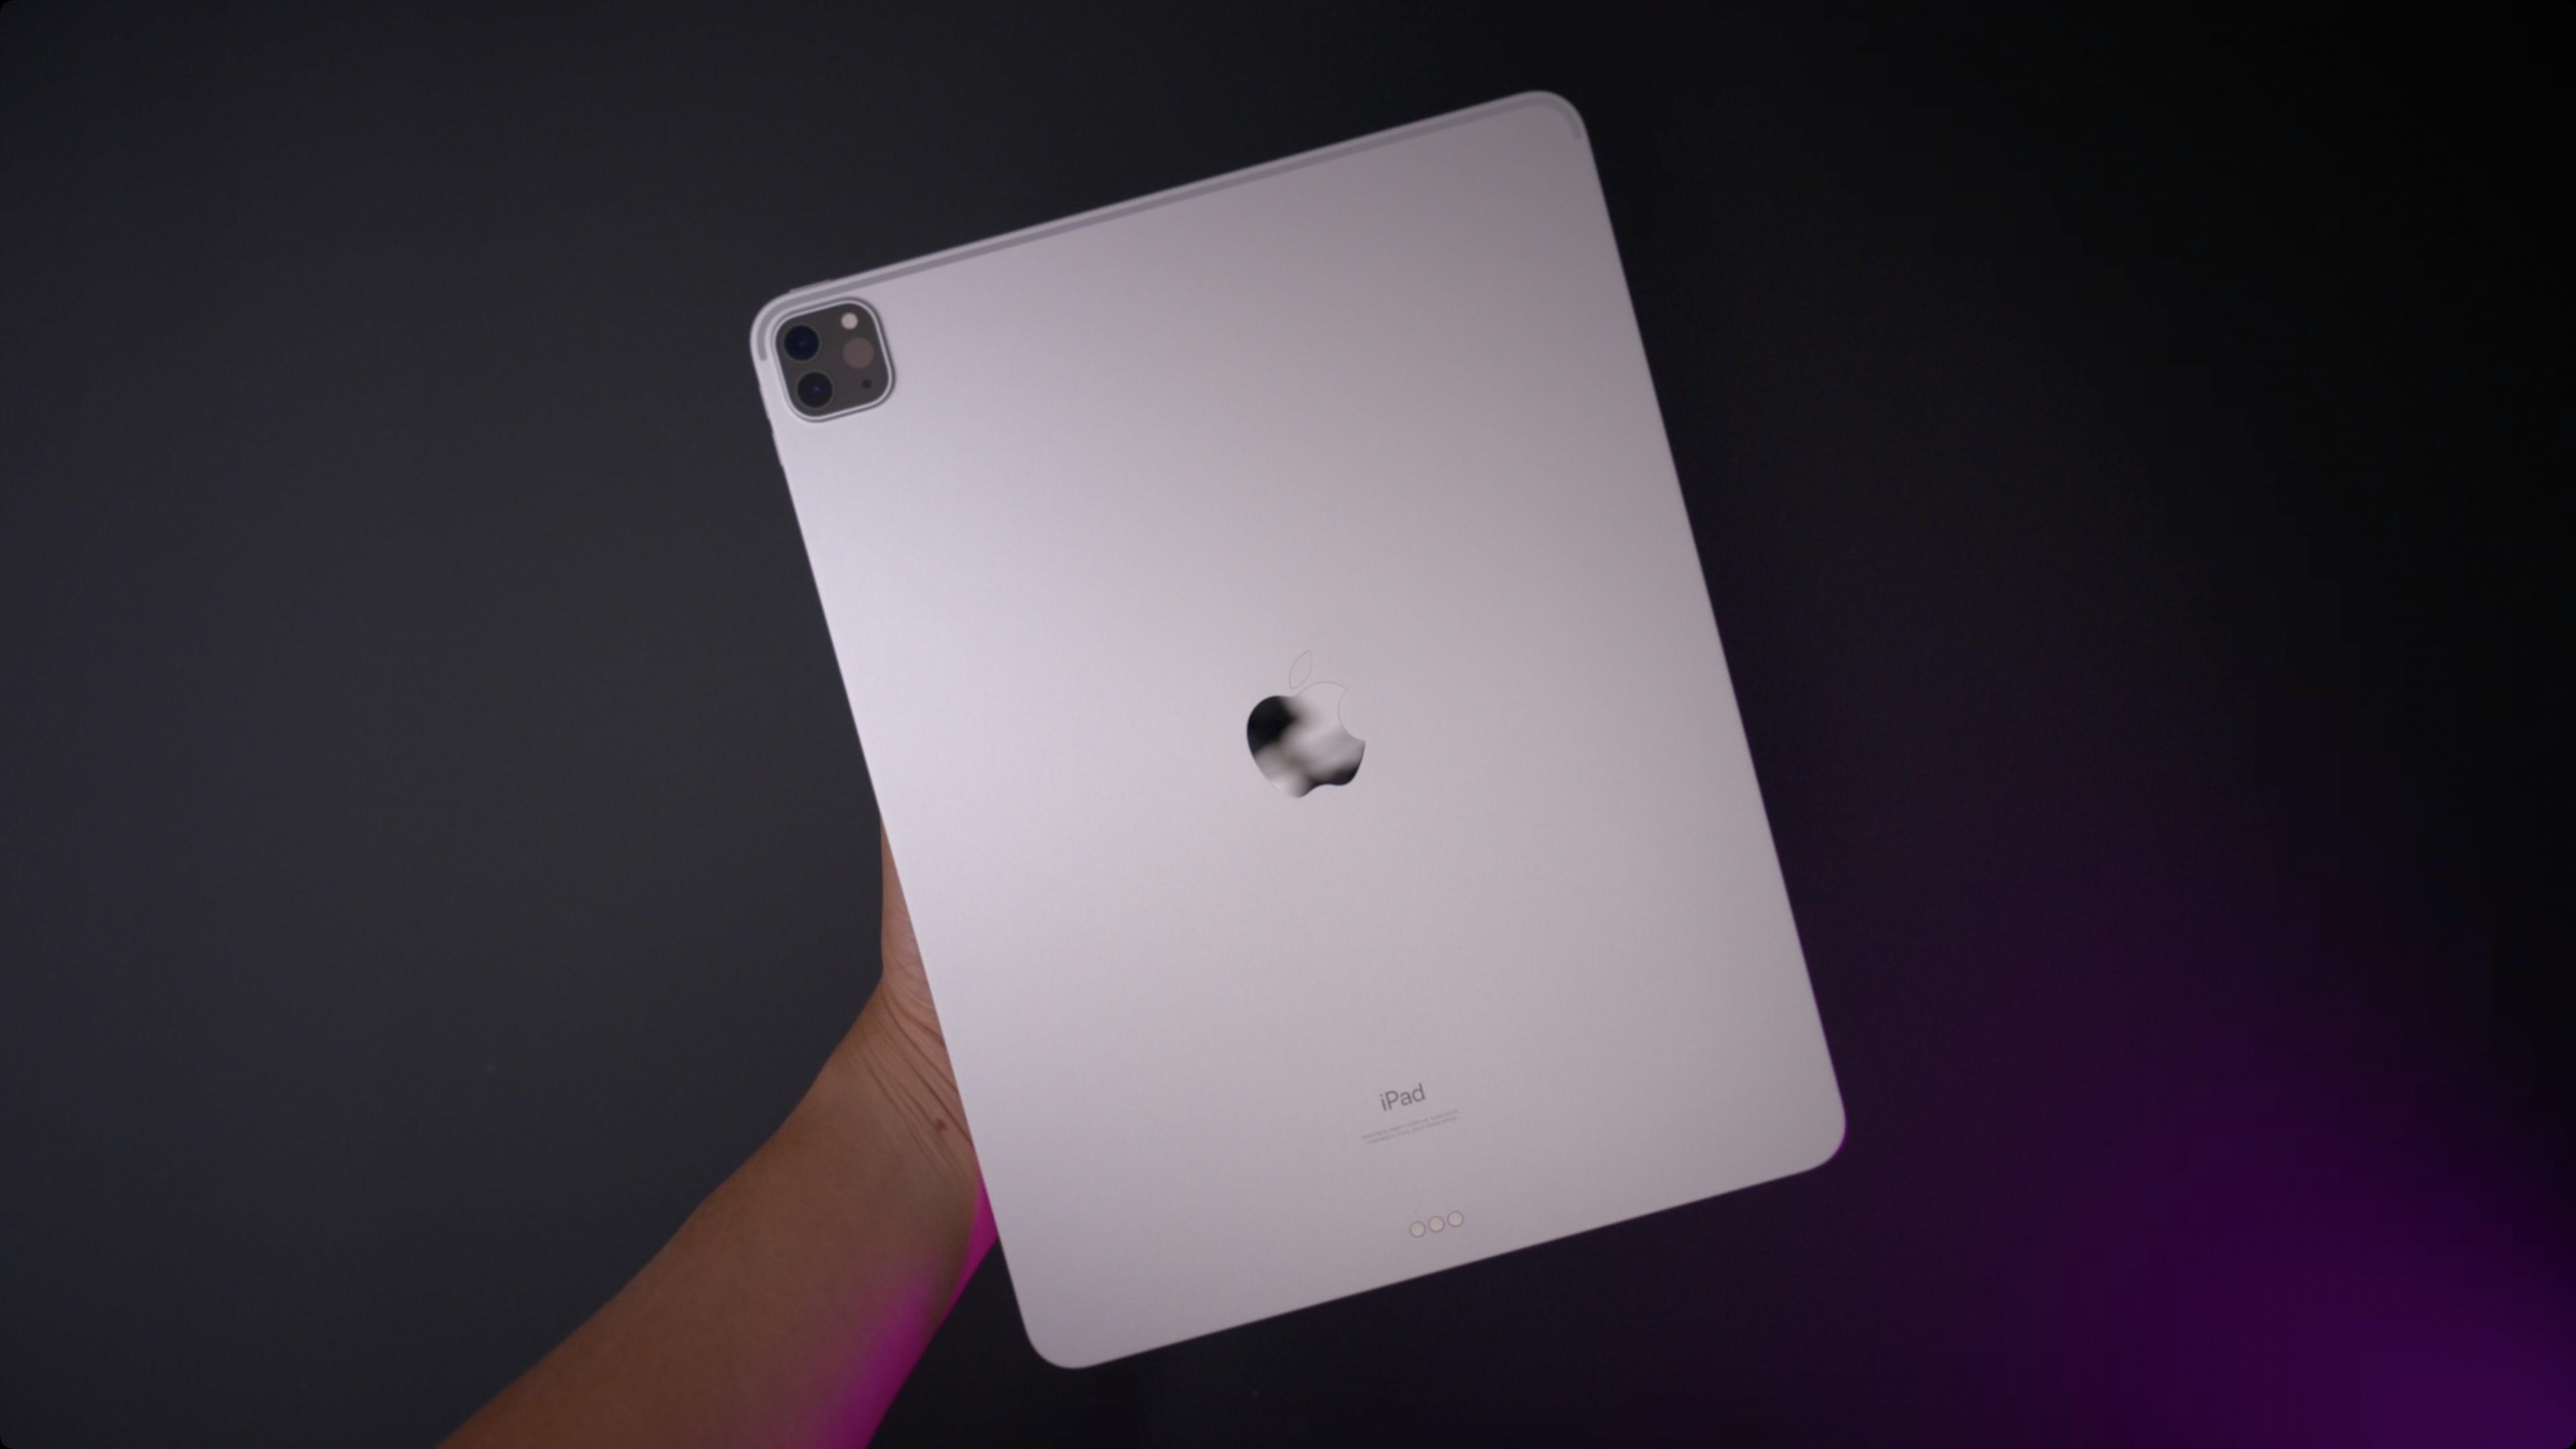 https://www.whathifi.com/reviews/apple-ipad-pro-129-2021